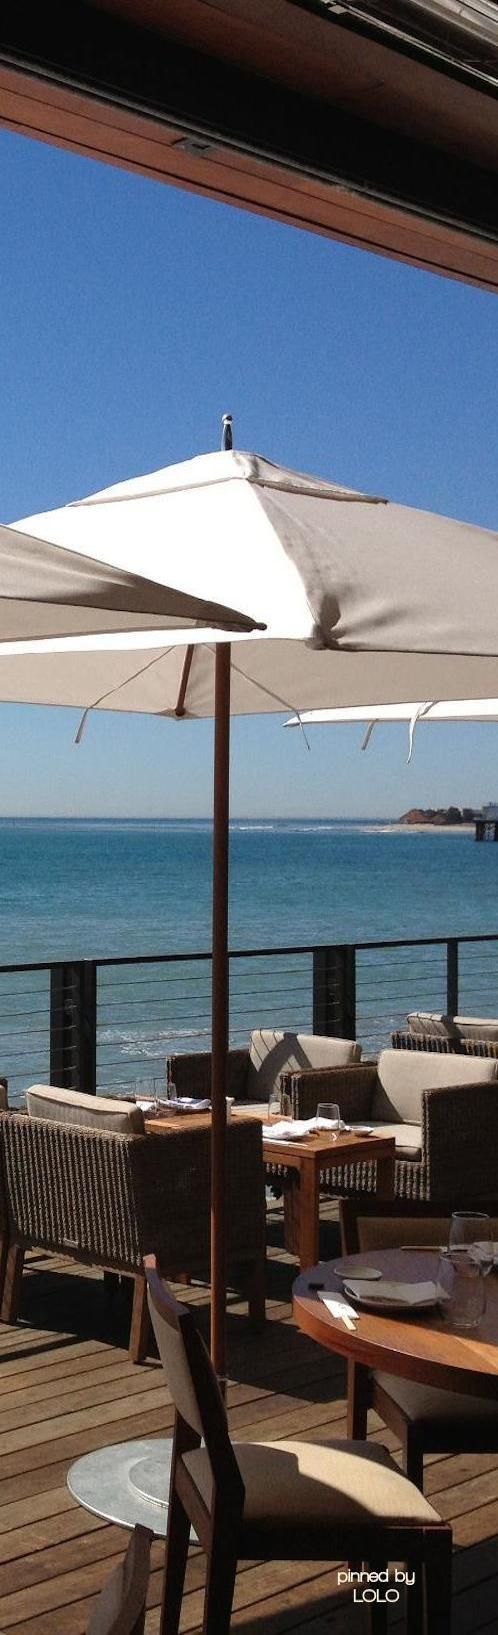 Lunch at NOBU Malibu . Food and view amazing.